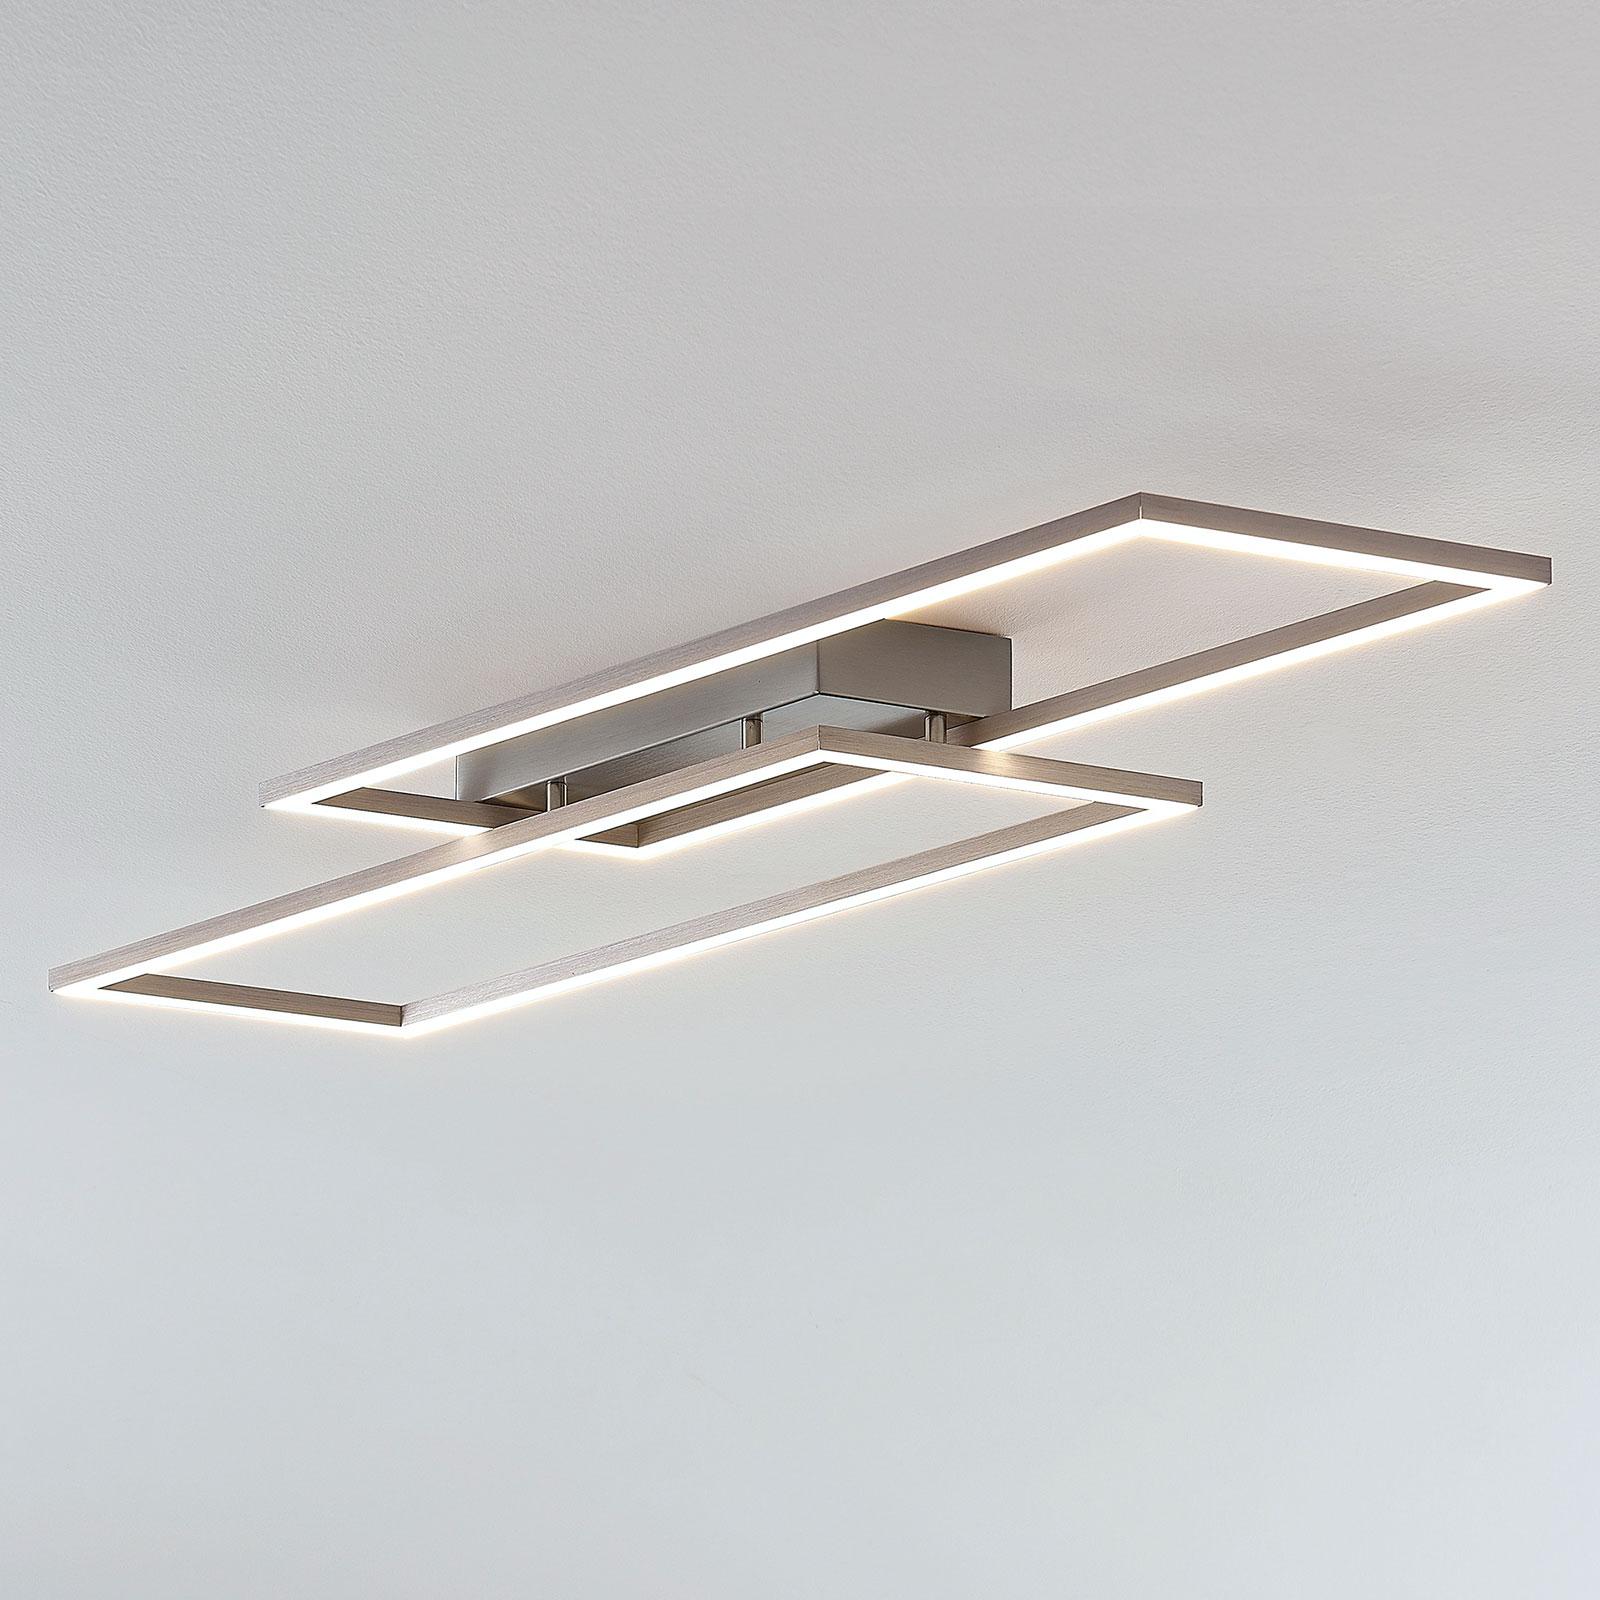 Plafonnier LED Quadra, dimmable, 2 lampes, 83,6cm